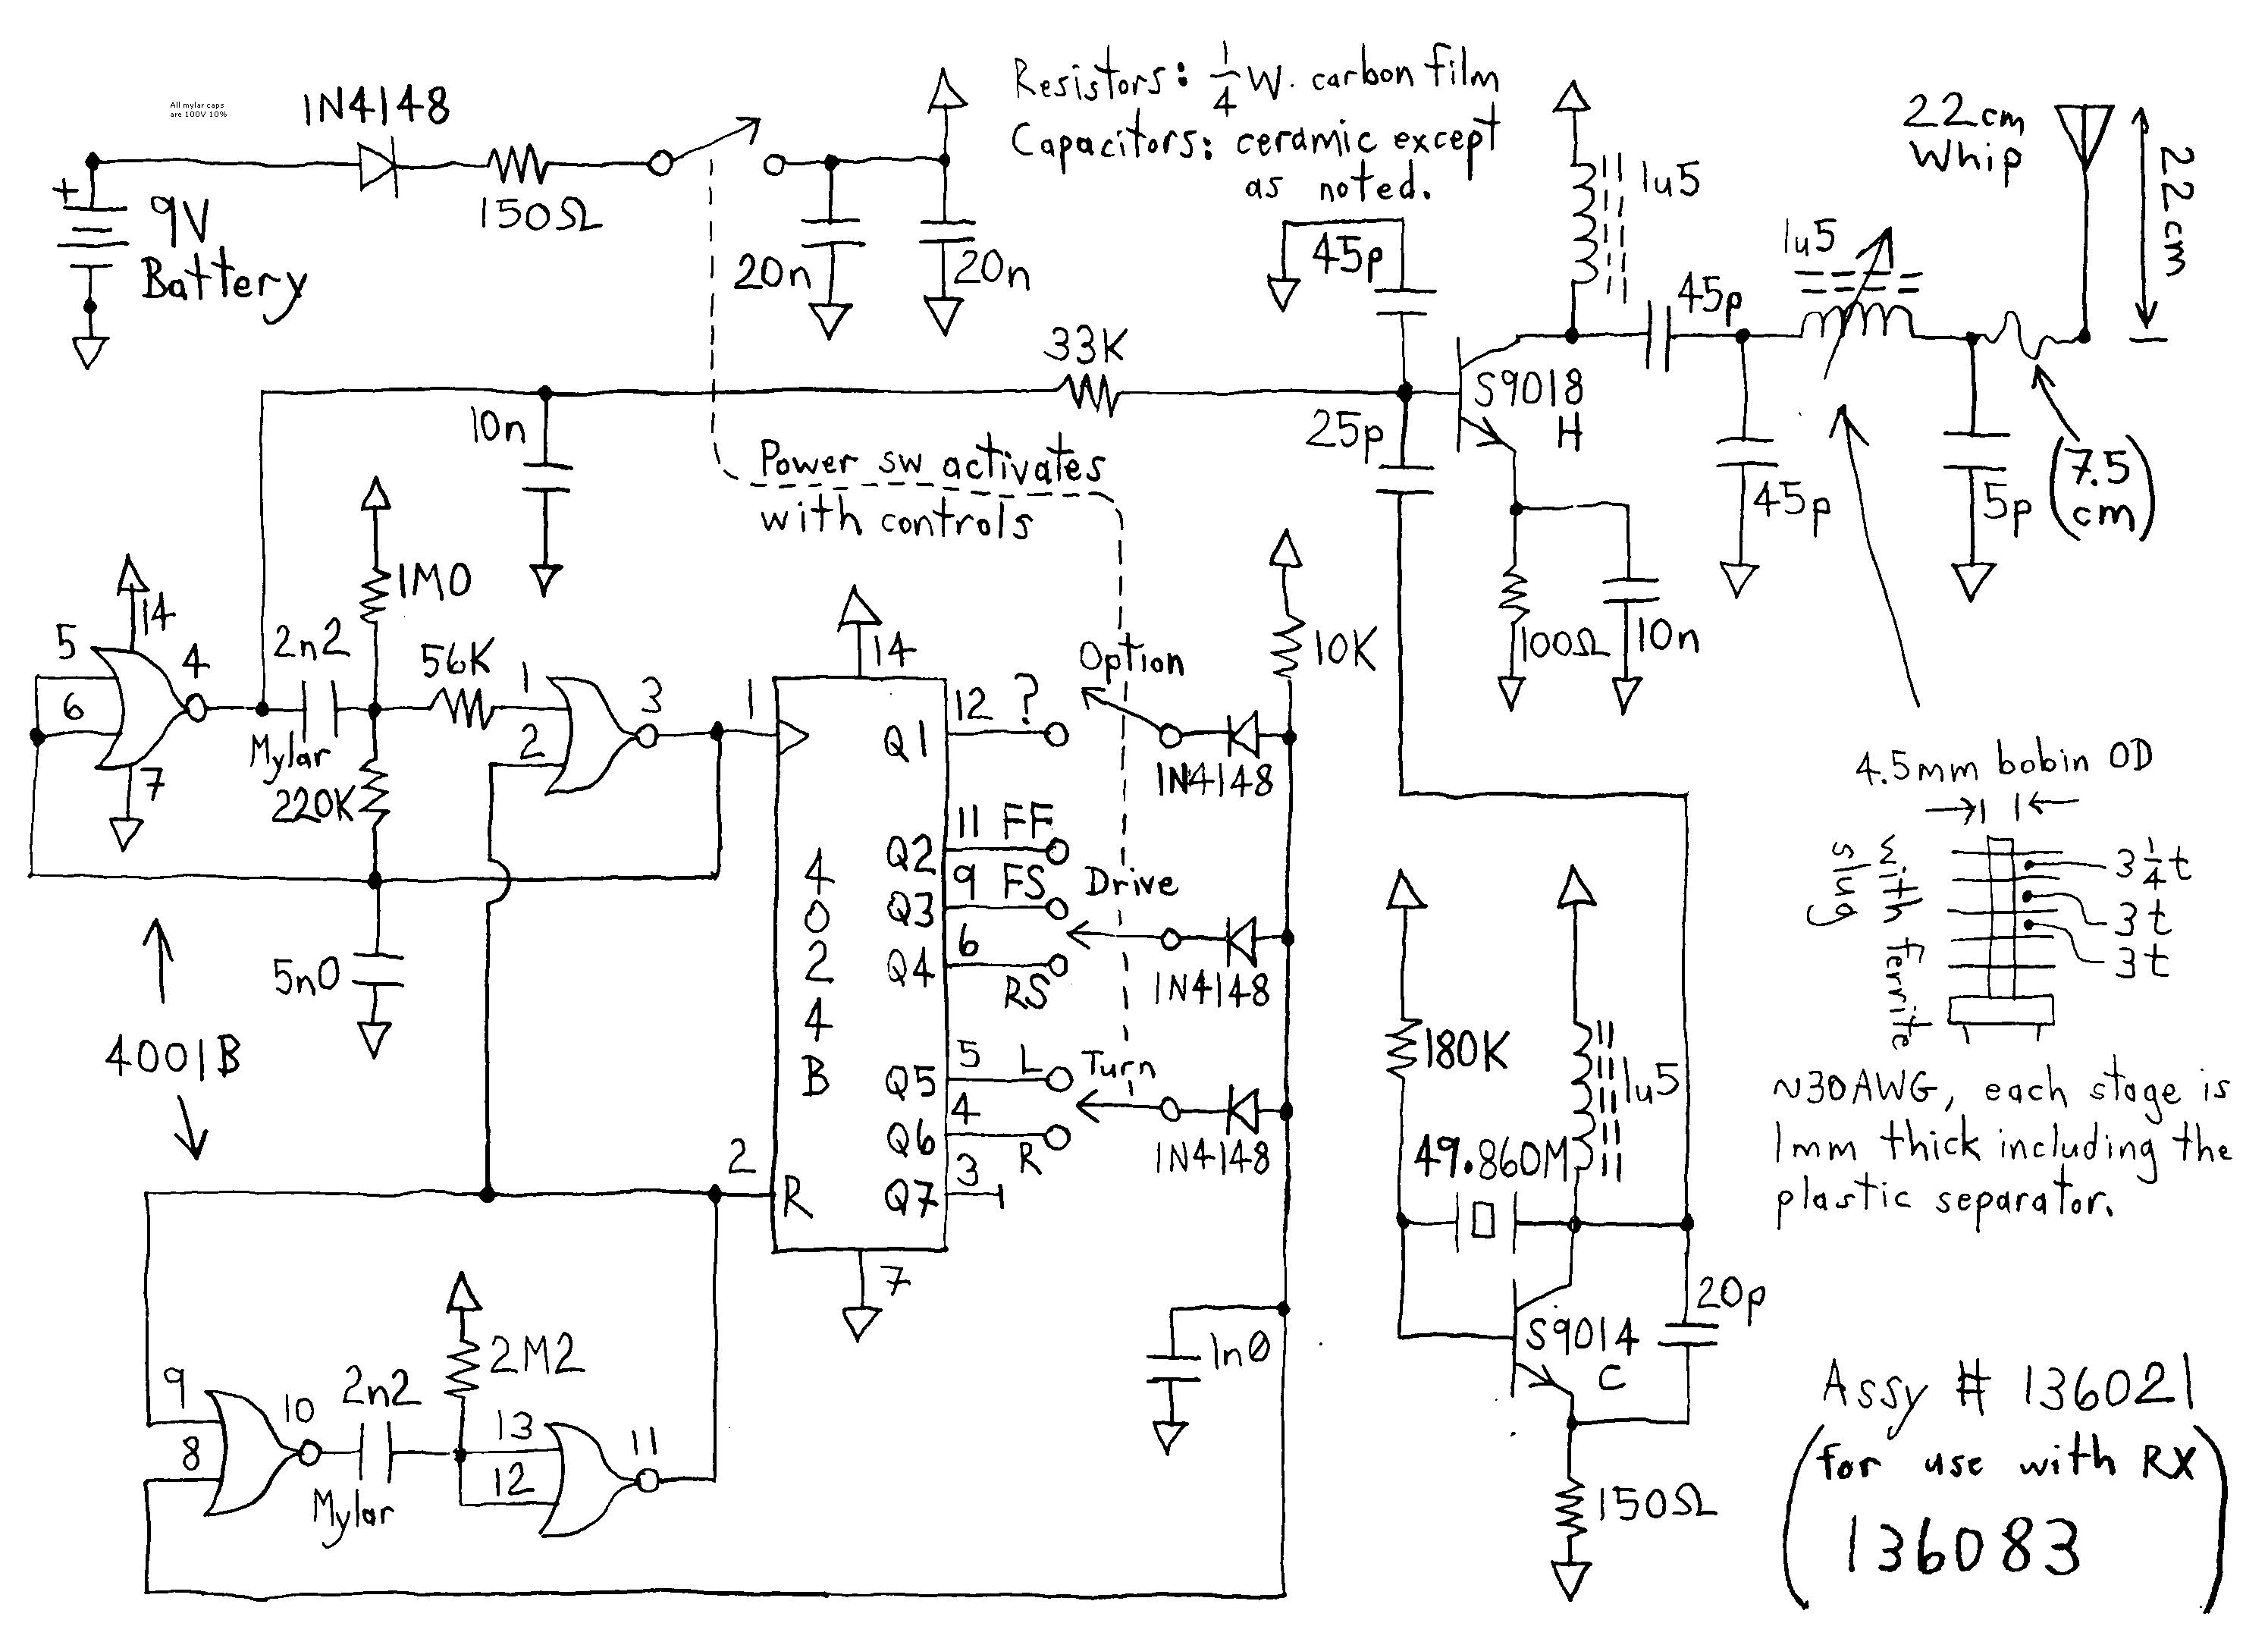 fenner fluid power wiring diagram Download-Wiring Diagram Sheets Detail Name fenner fluid power 3-l